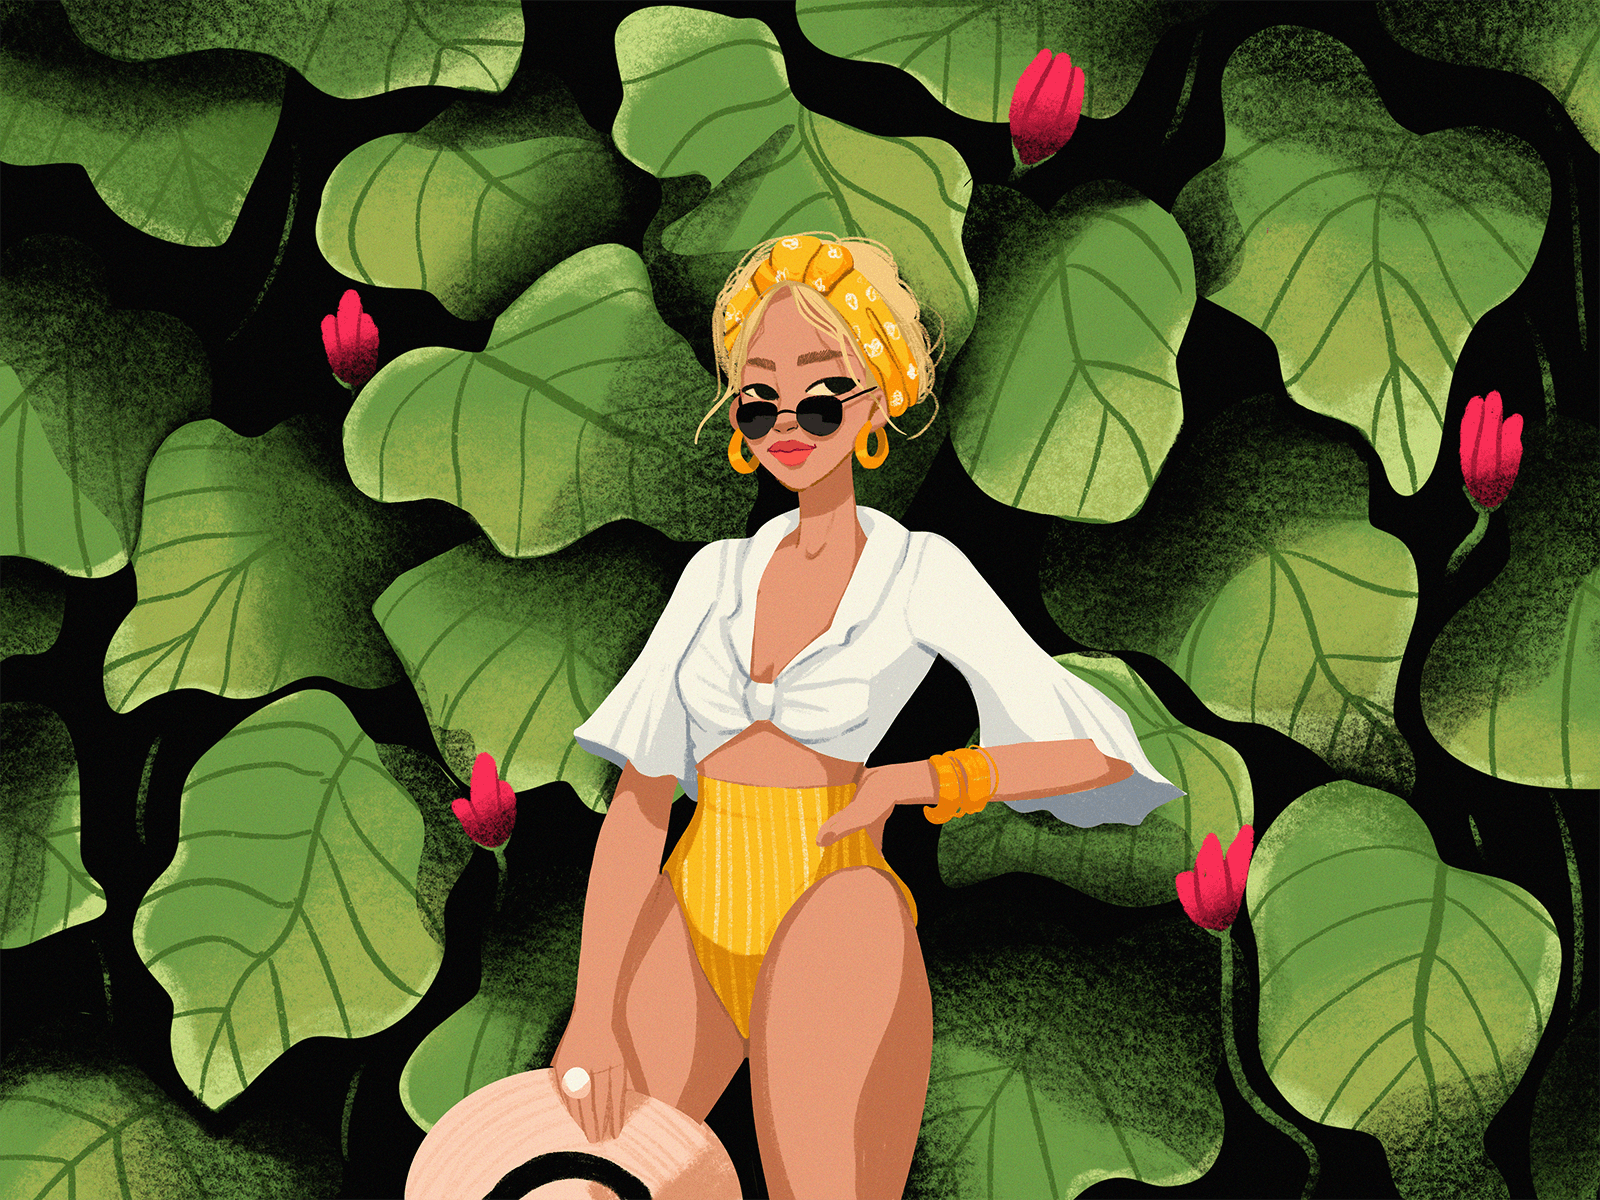 summer throwback illustration